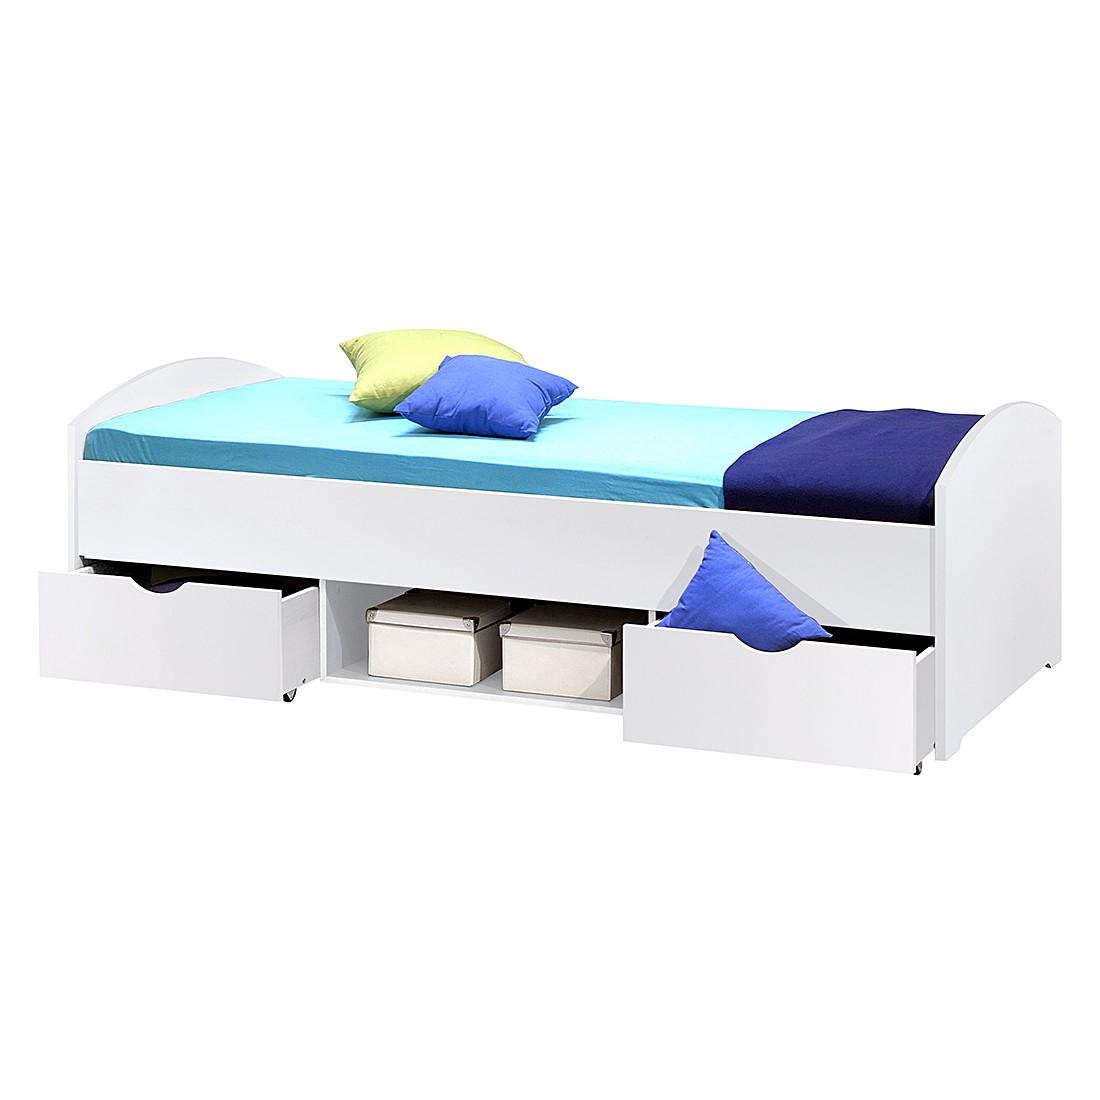 kojenbett wei preis vergleich 2016. Black Bedroom Furniture Sets. Home Design Ideas